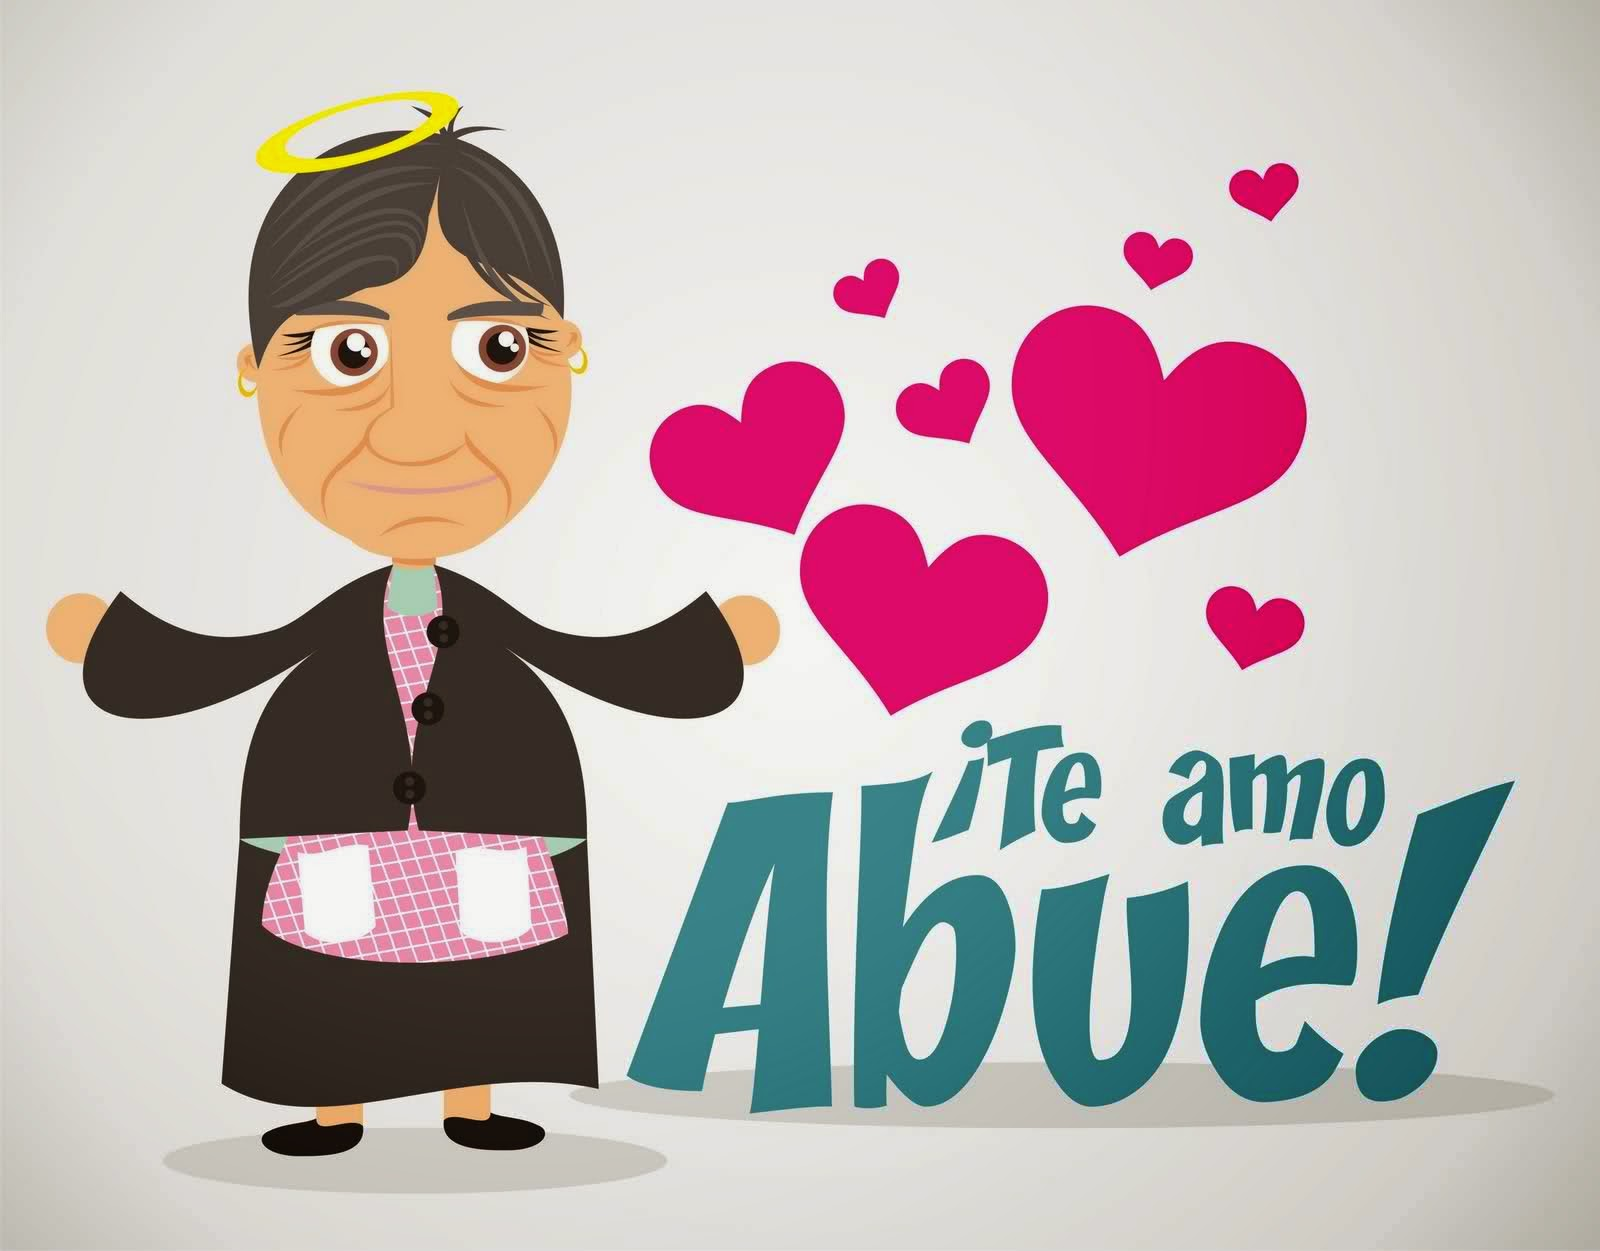 Abuela Frases frases de amor para mi abuela frases de amor